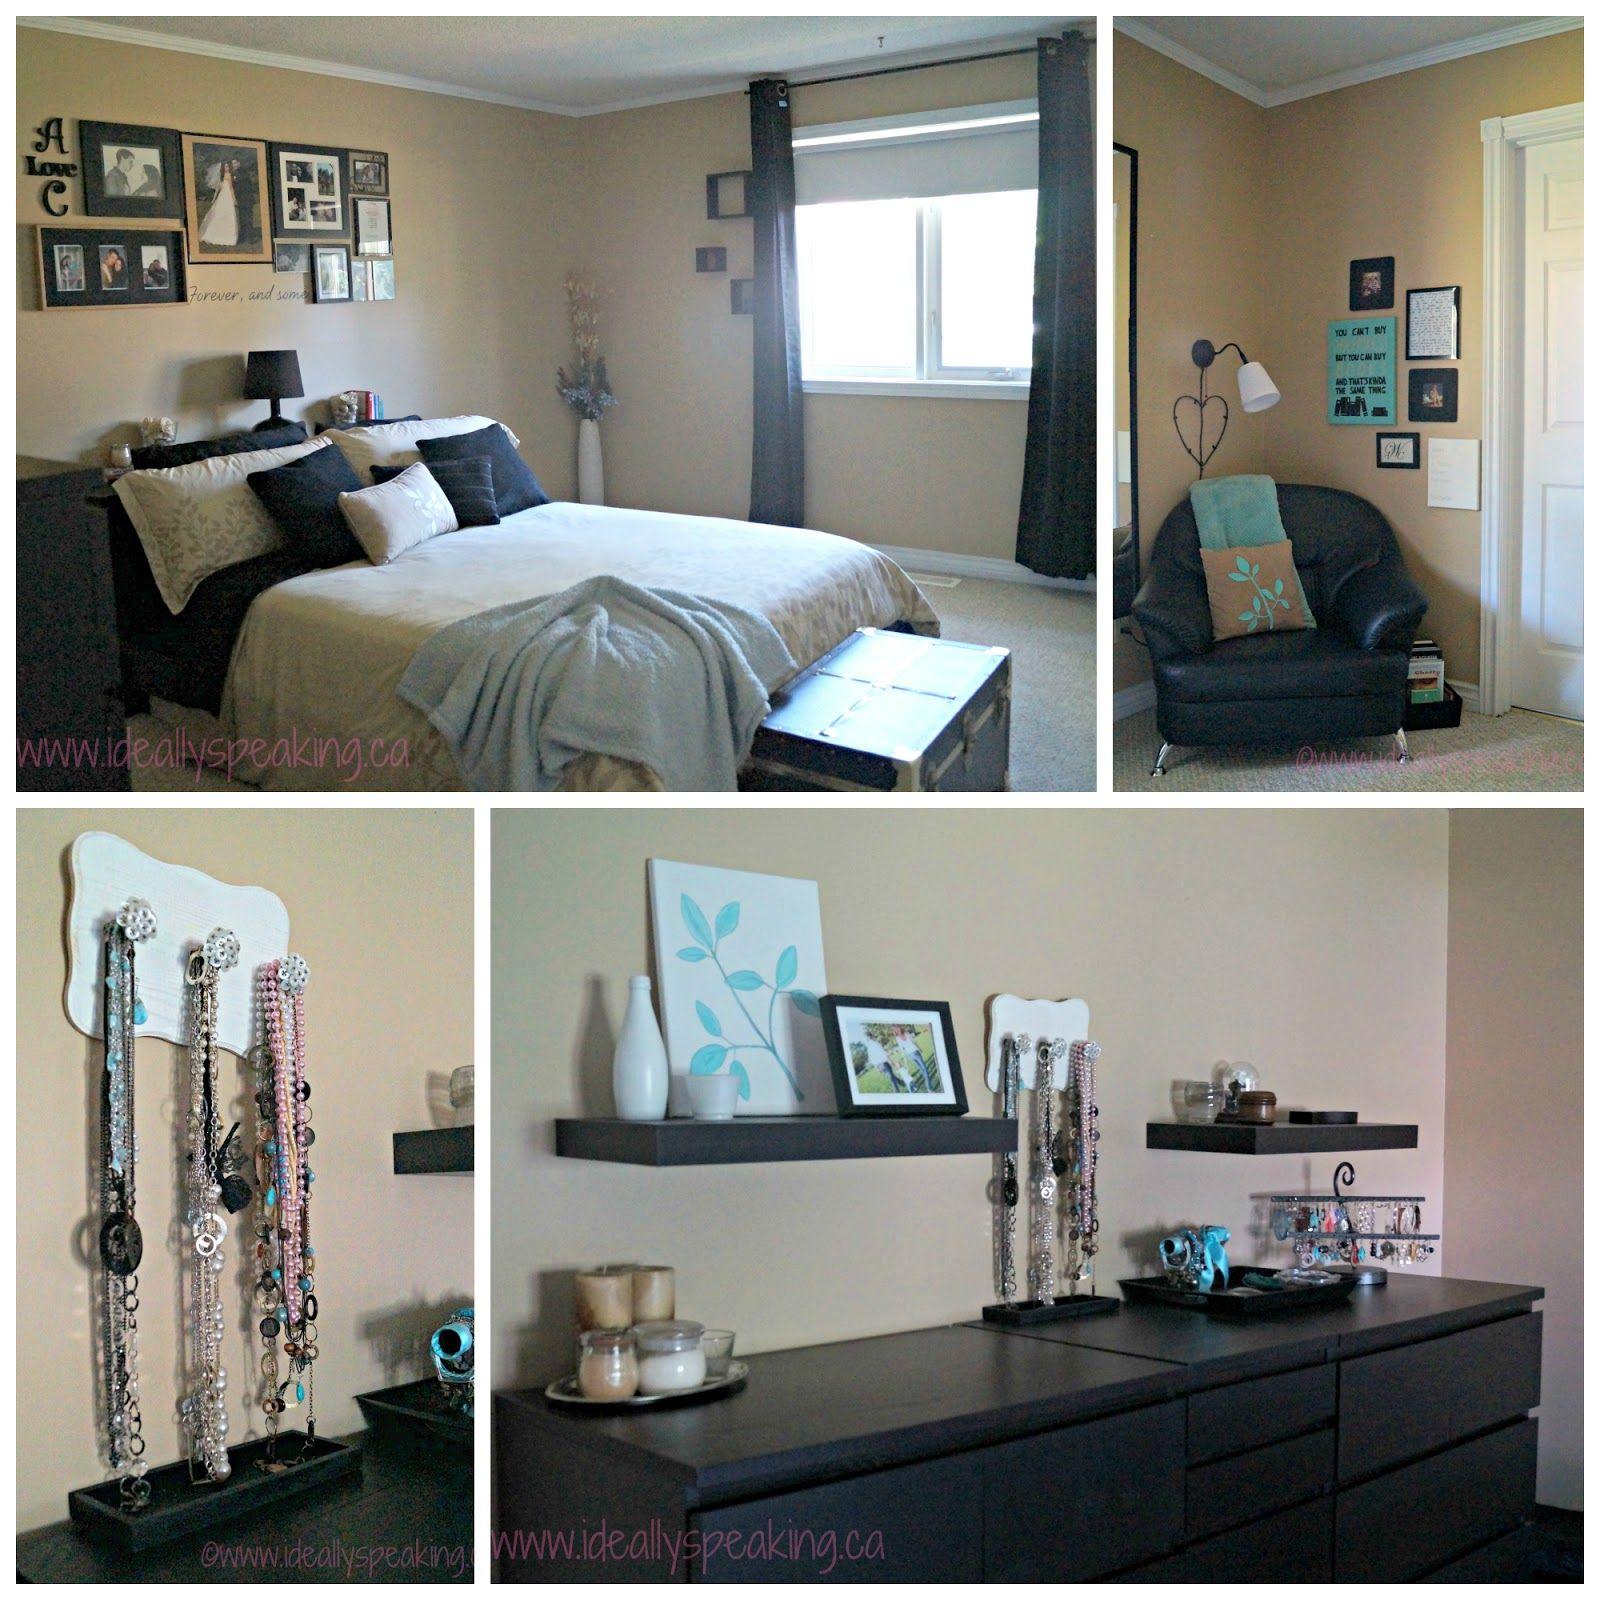 Living Room Pinterest House Decor images master bedroom pinterest diy decor room furnitures beautiful